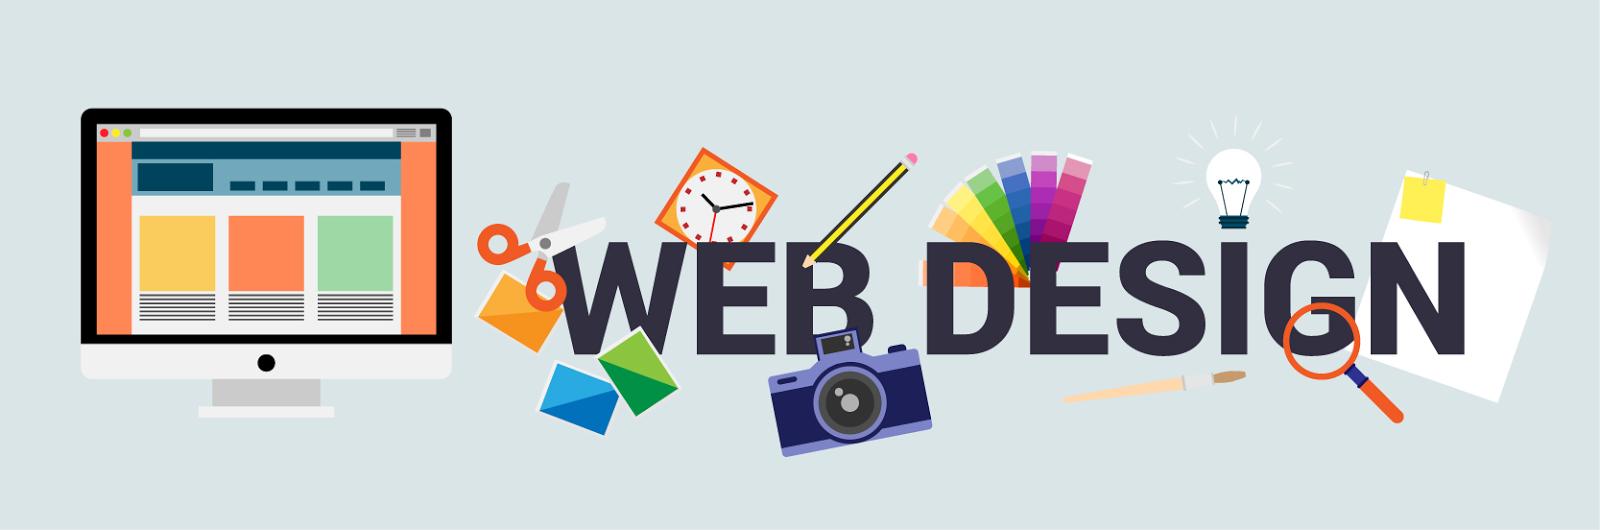 Web Design Company In Dhaka Http Www Techneo360 Com Website Design And Development Company Custom Web Design Website Design Services Website Design Company